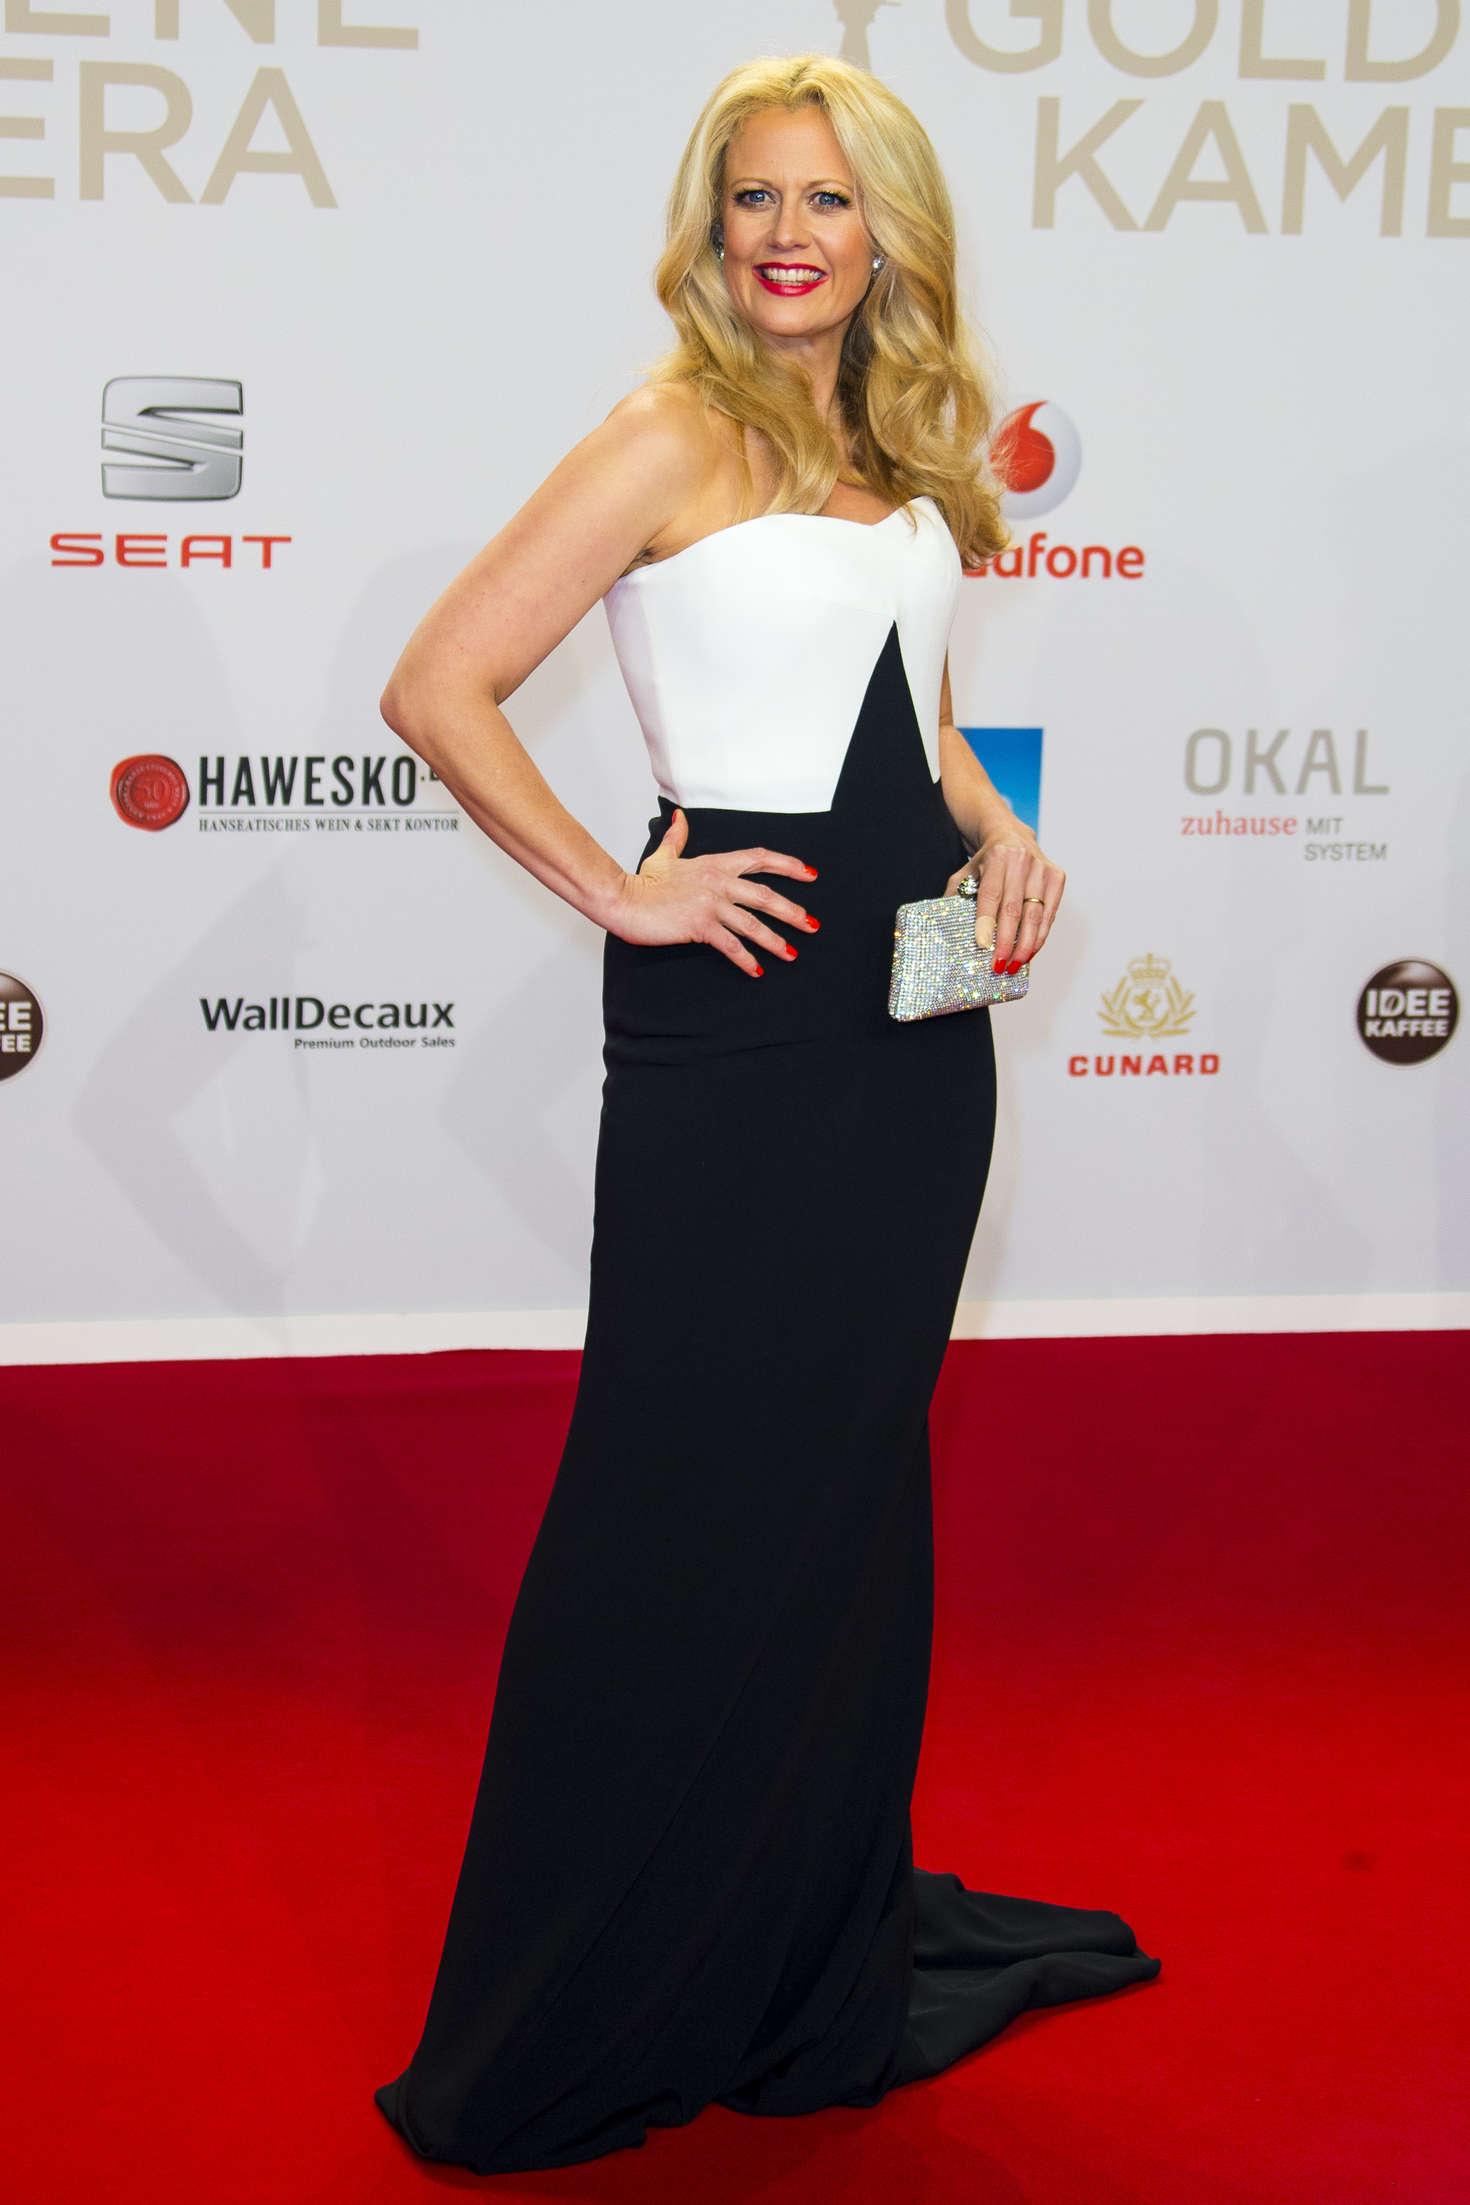 Barbara Schoneberger 2016 : Barbara Schoneberger: 51st Annual Goldene Kamera Award -06